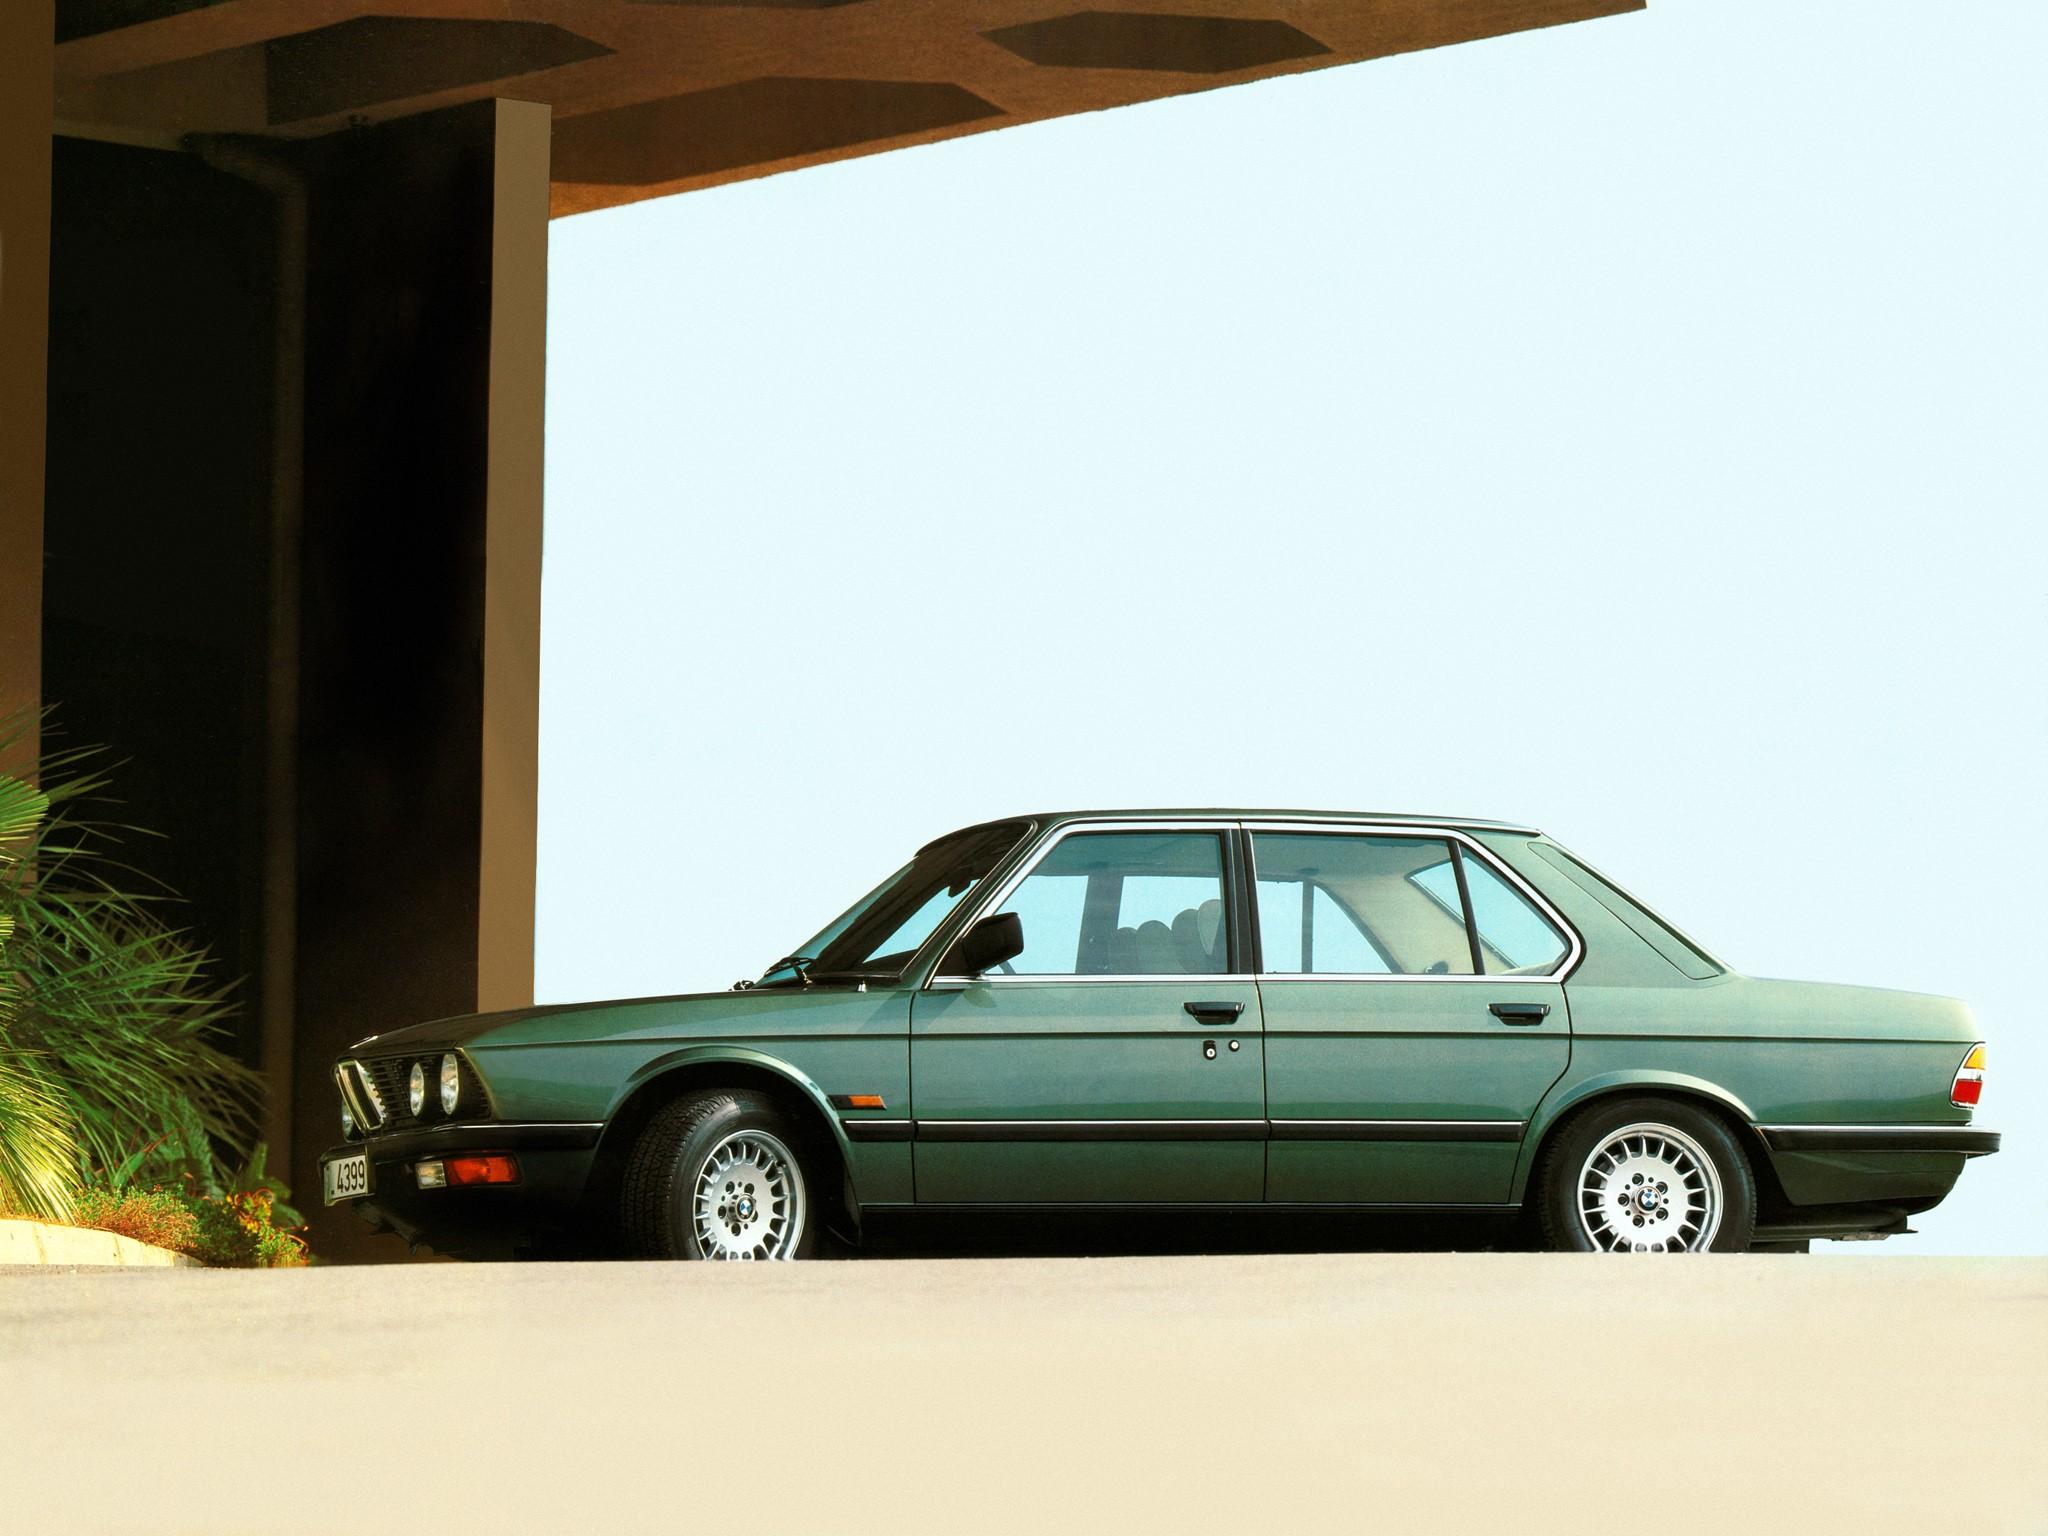 Bmw 5 Series E28 Specs 1981 1982 1983 1984 1985